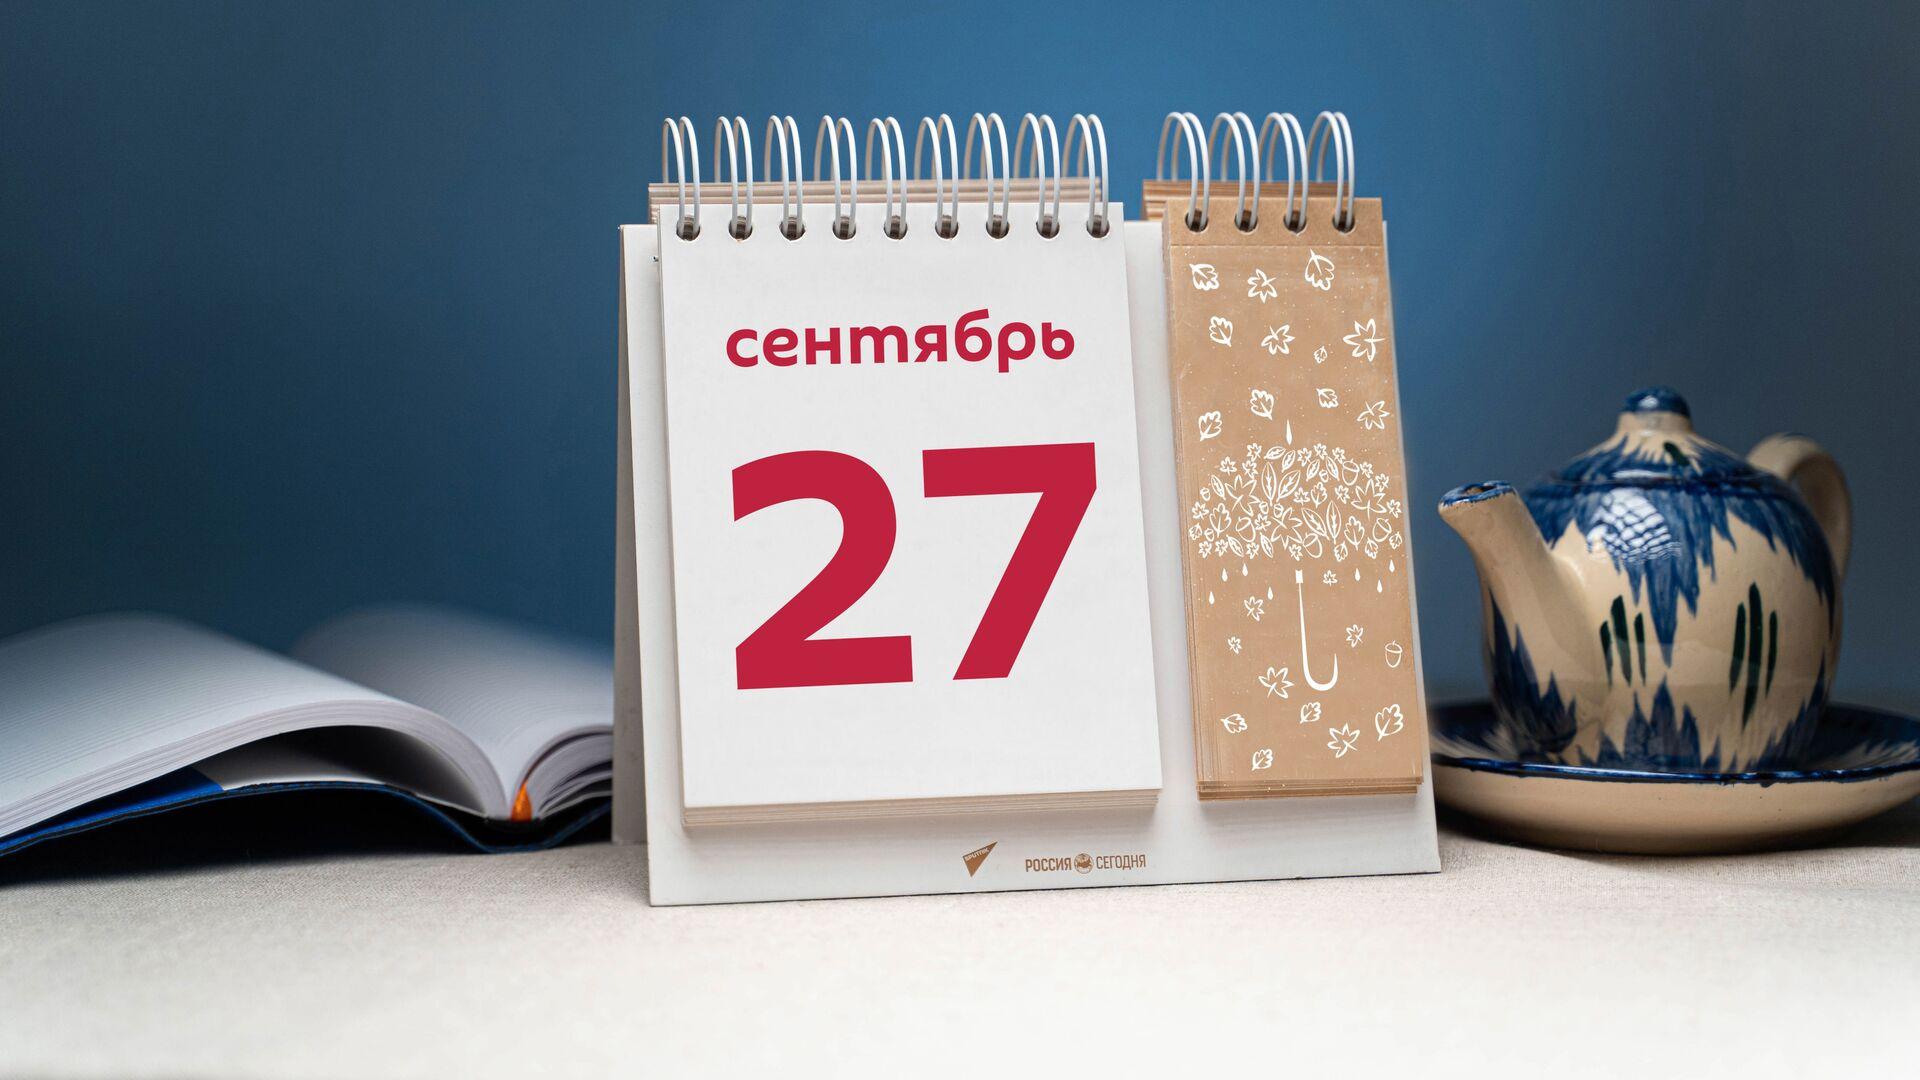 День 27 сентября - Sputnik Тоҷикистон, 1920, 27.09.2021